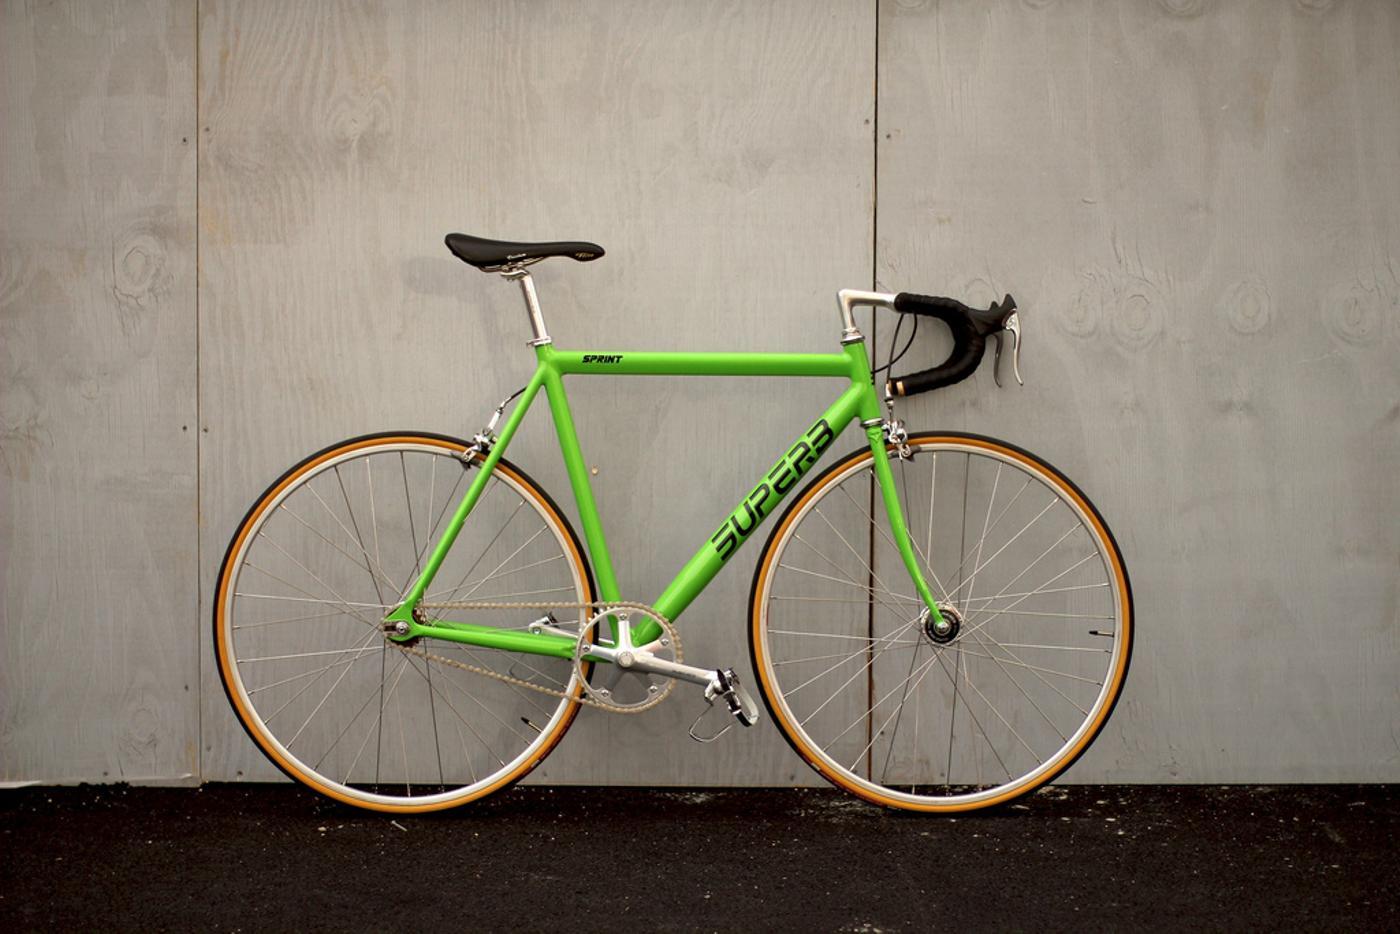 Superb: Antonio's Special Edition Kawasaki Green Superb Sprint